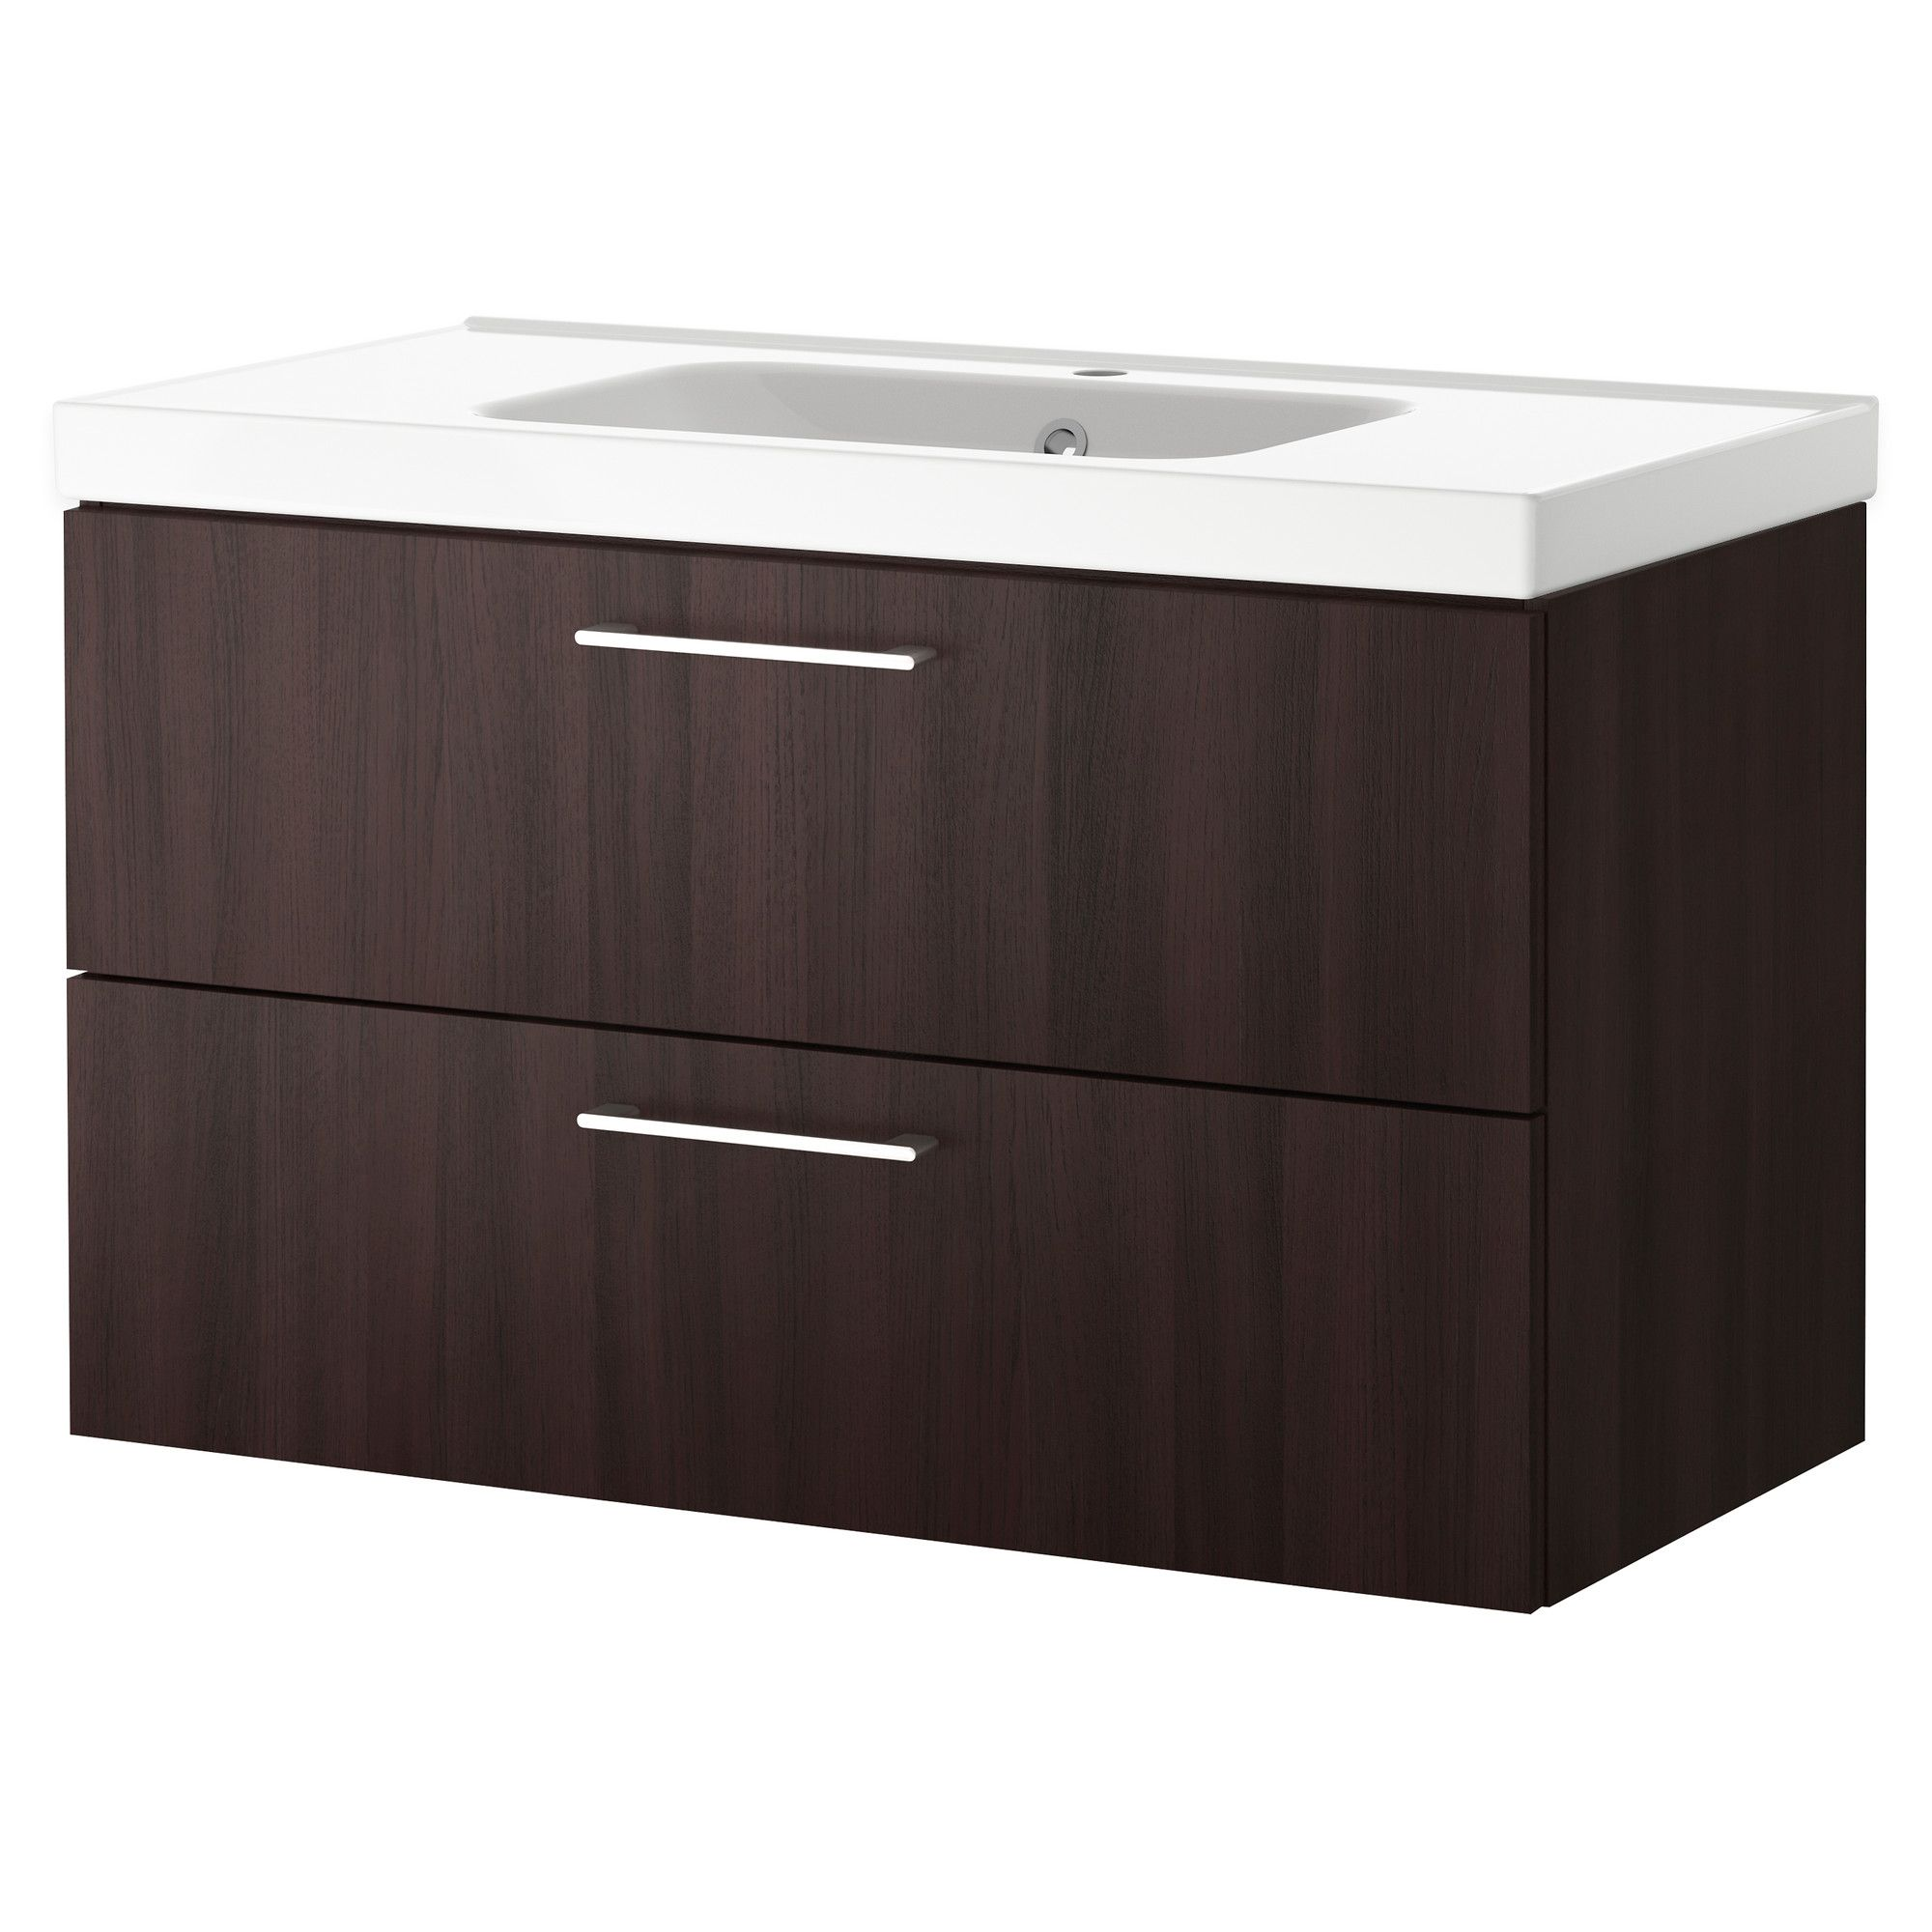 godmorgon odensvik meuble pour lavabo 2 tiroirs brun. Black Bedroom Furniture Sets. Home Design Ideas